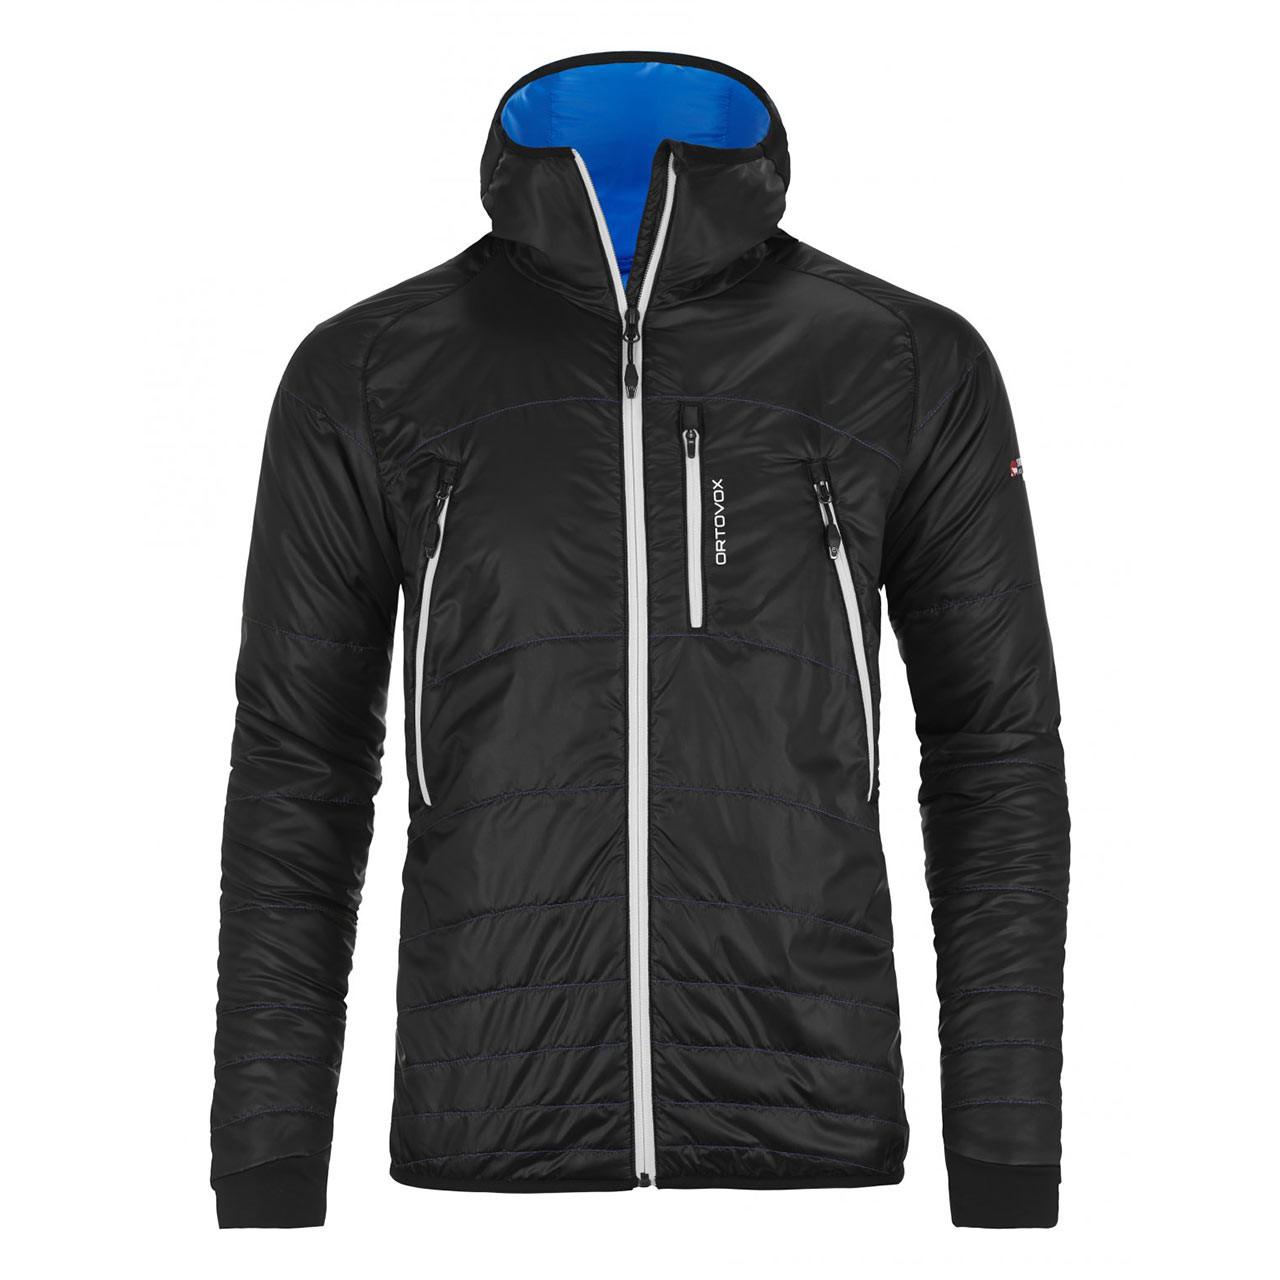 Street bunda Ortovox Piz Boé Jacket black raven